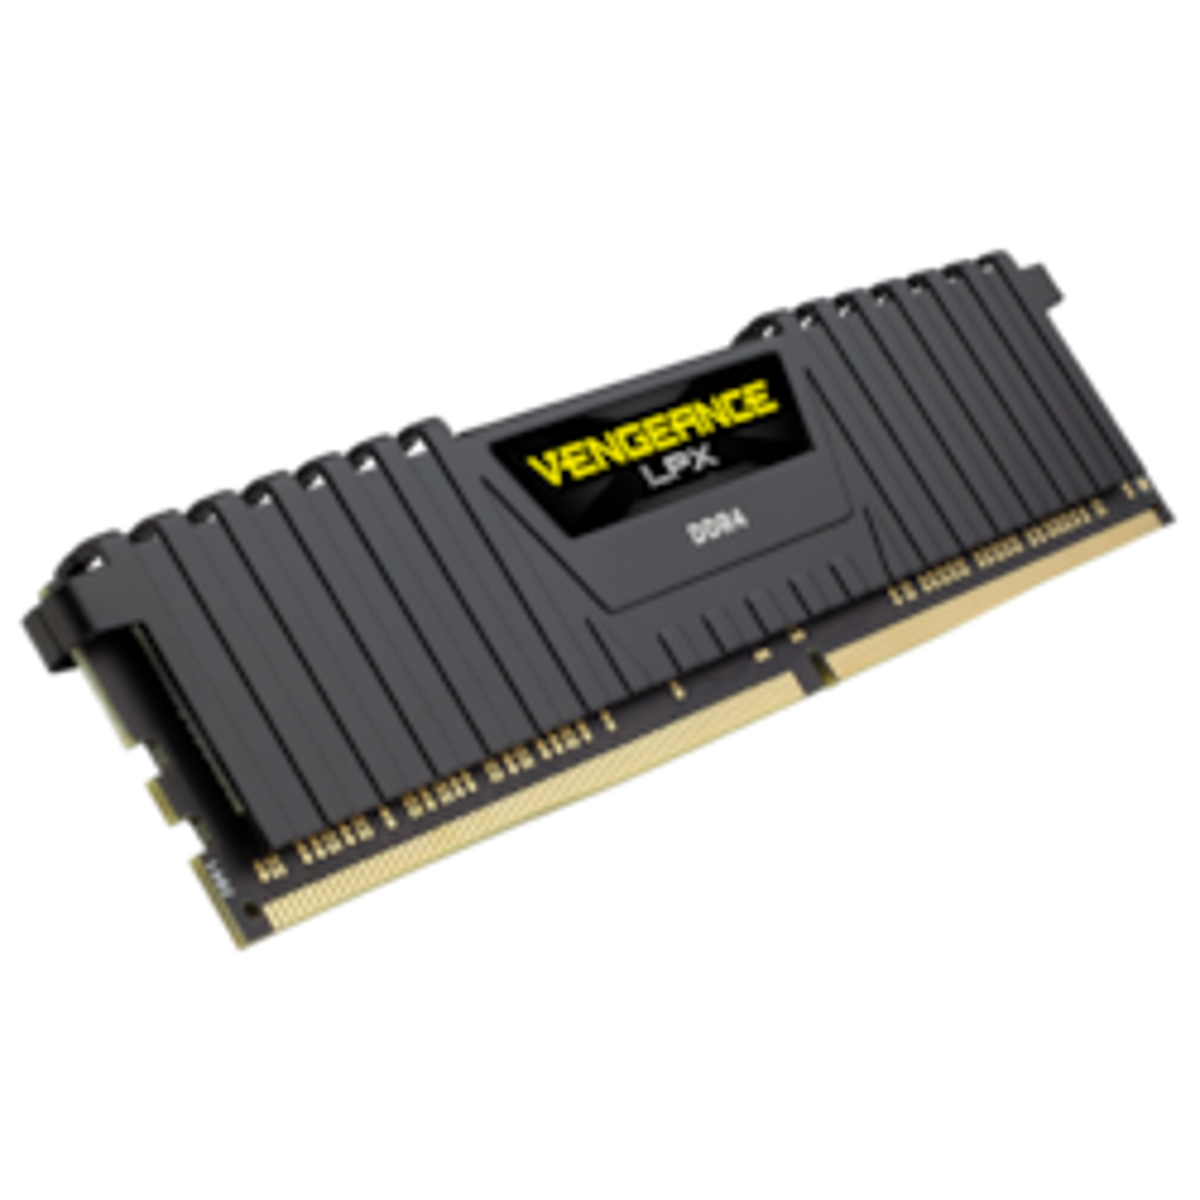 Corsair Vengeance LPX 32GB (1x32GB) DDR4 3000MHz C16 15-15-15-36 1.2V XMP 2.0 Desktop Gaming Memory Black